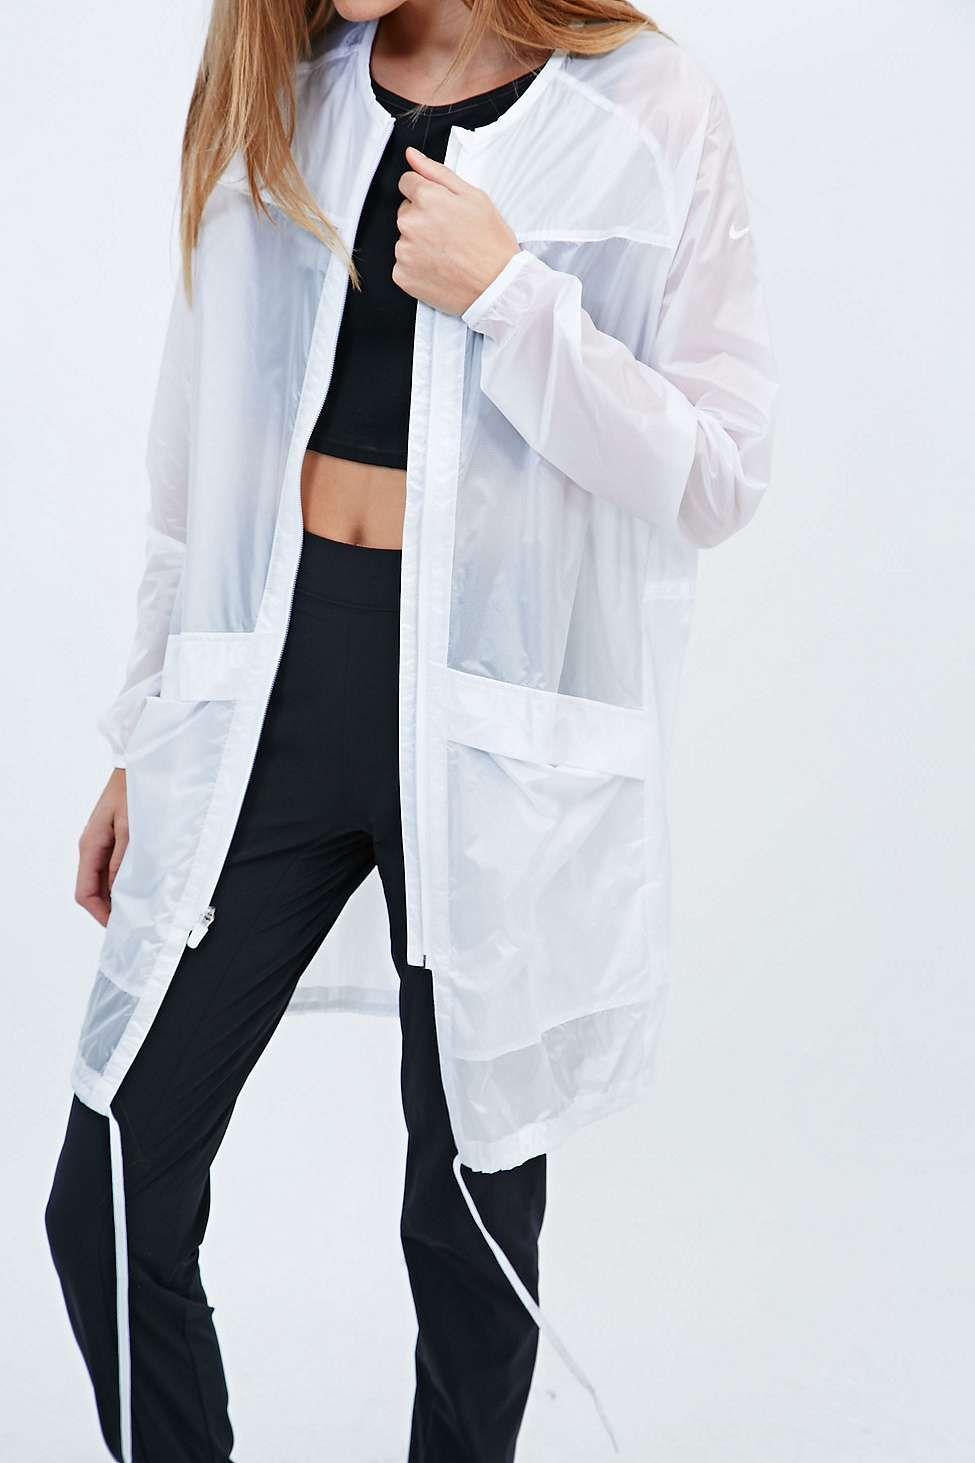 BlancheIdee NikeEt Nike Transparente Nike Veste IYHED29eW